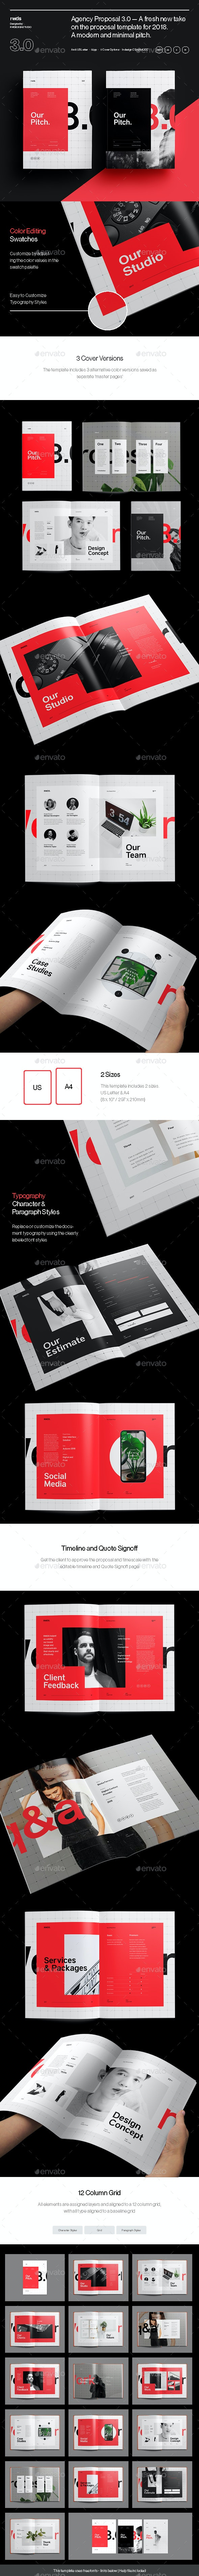 Agency Proposal 3.0 - Corporate Brochures